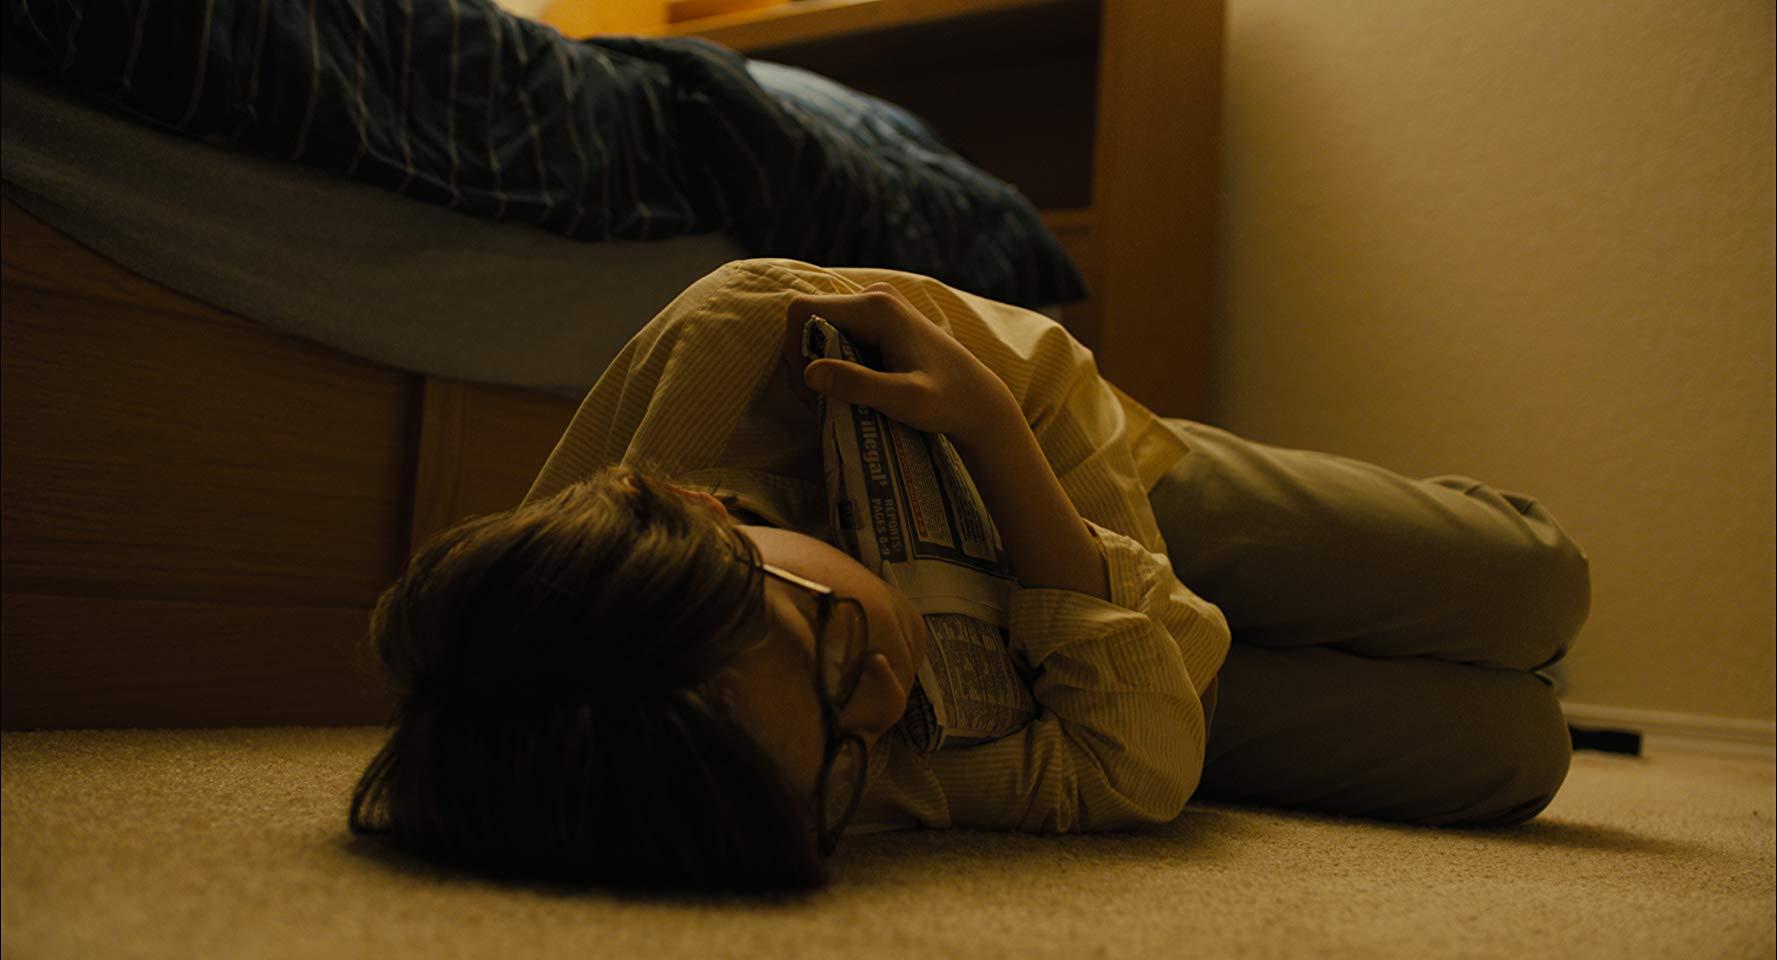 Primer tráiler de The Goldfinch muestra a una seria candidata al Óscar 2020